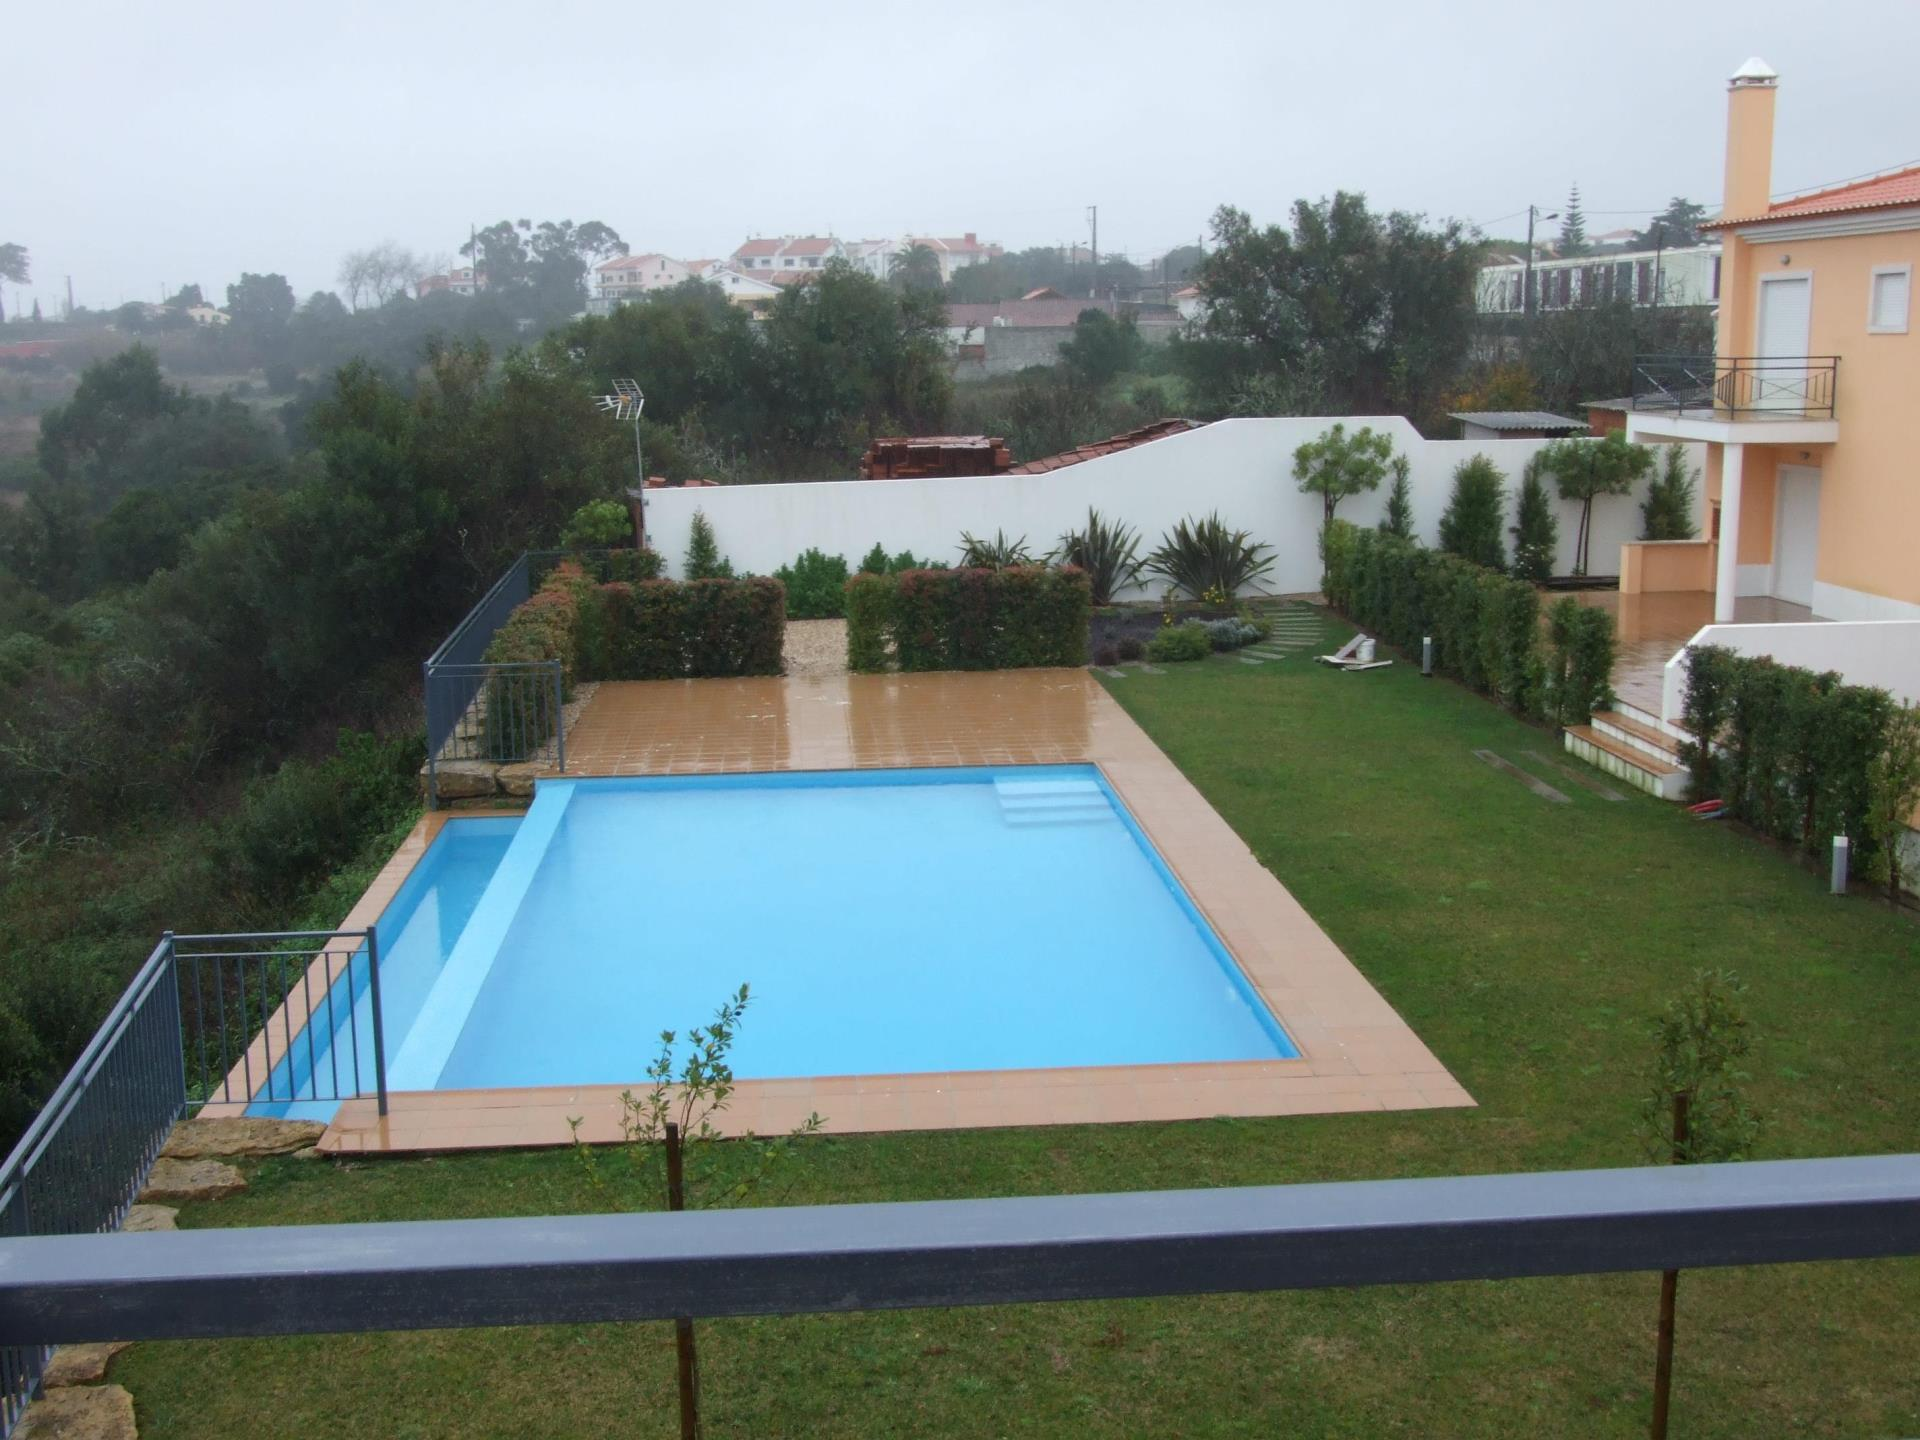 独户住宅 为 销售 在 House, 4 bedrooms, for Sale Sintra, 葡京 葡萄牙